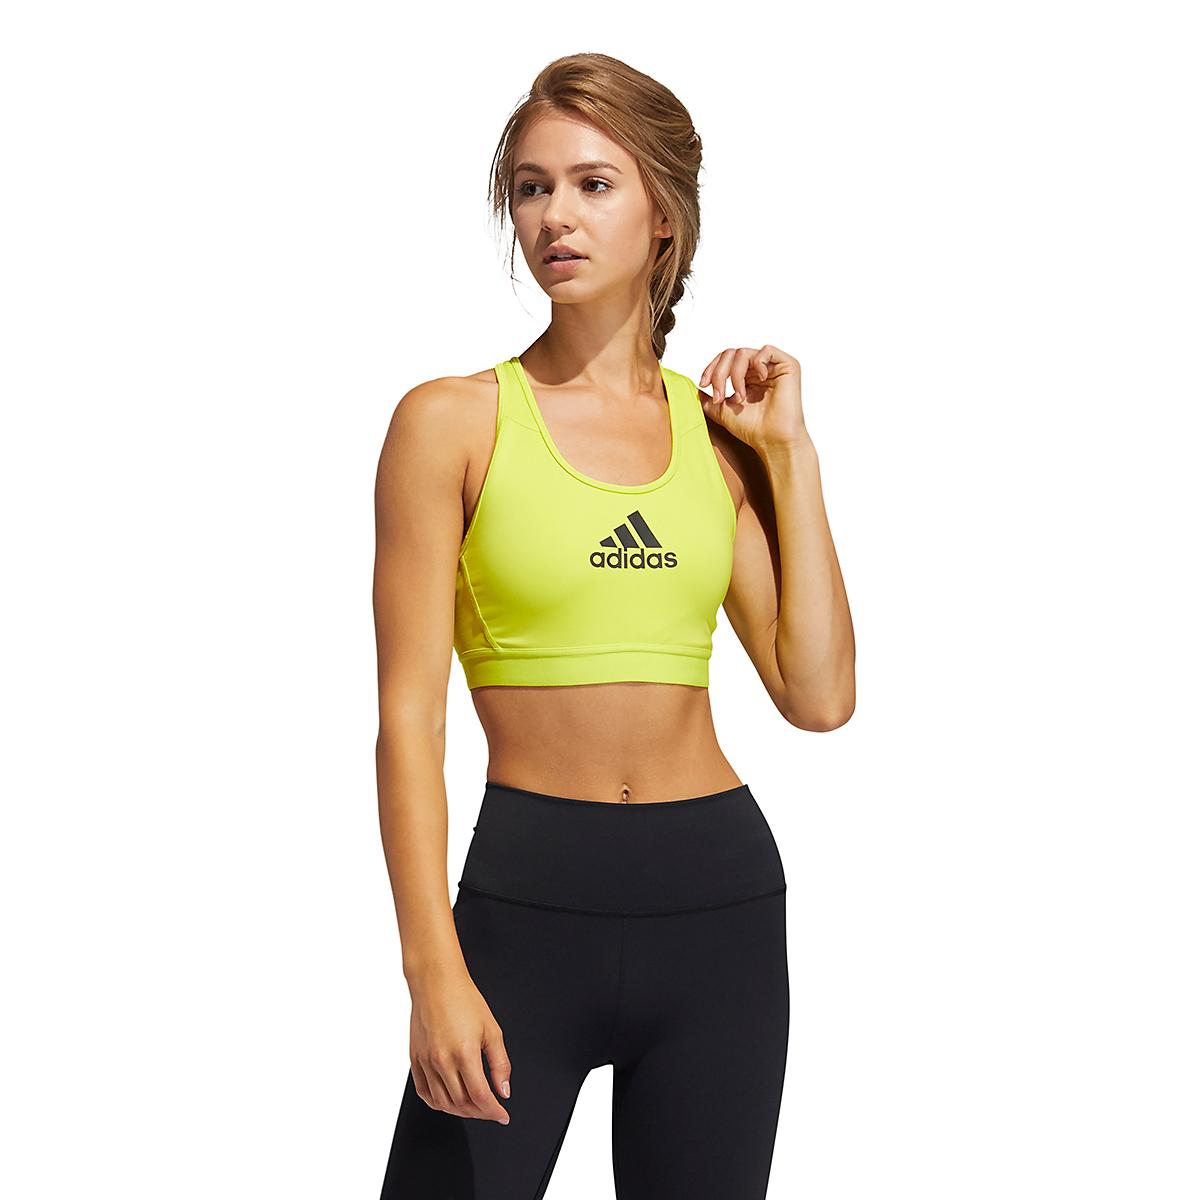 Women's Adidas Don't Rest Alphaskin Bra - Color: Acid Yellow - Size: XXS, Acid Yellow, large, image 1